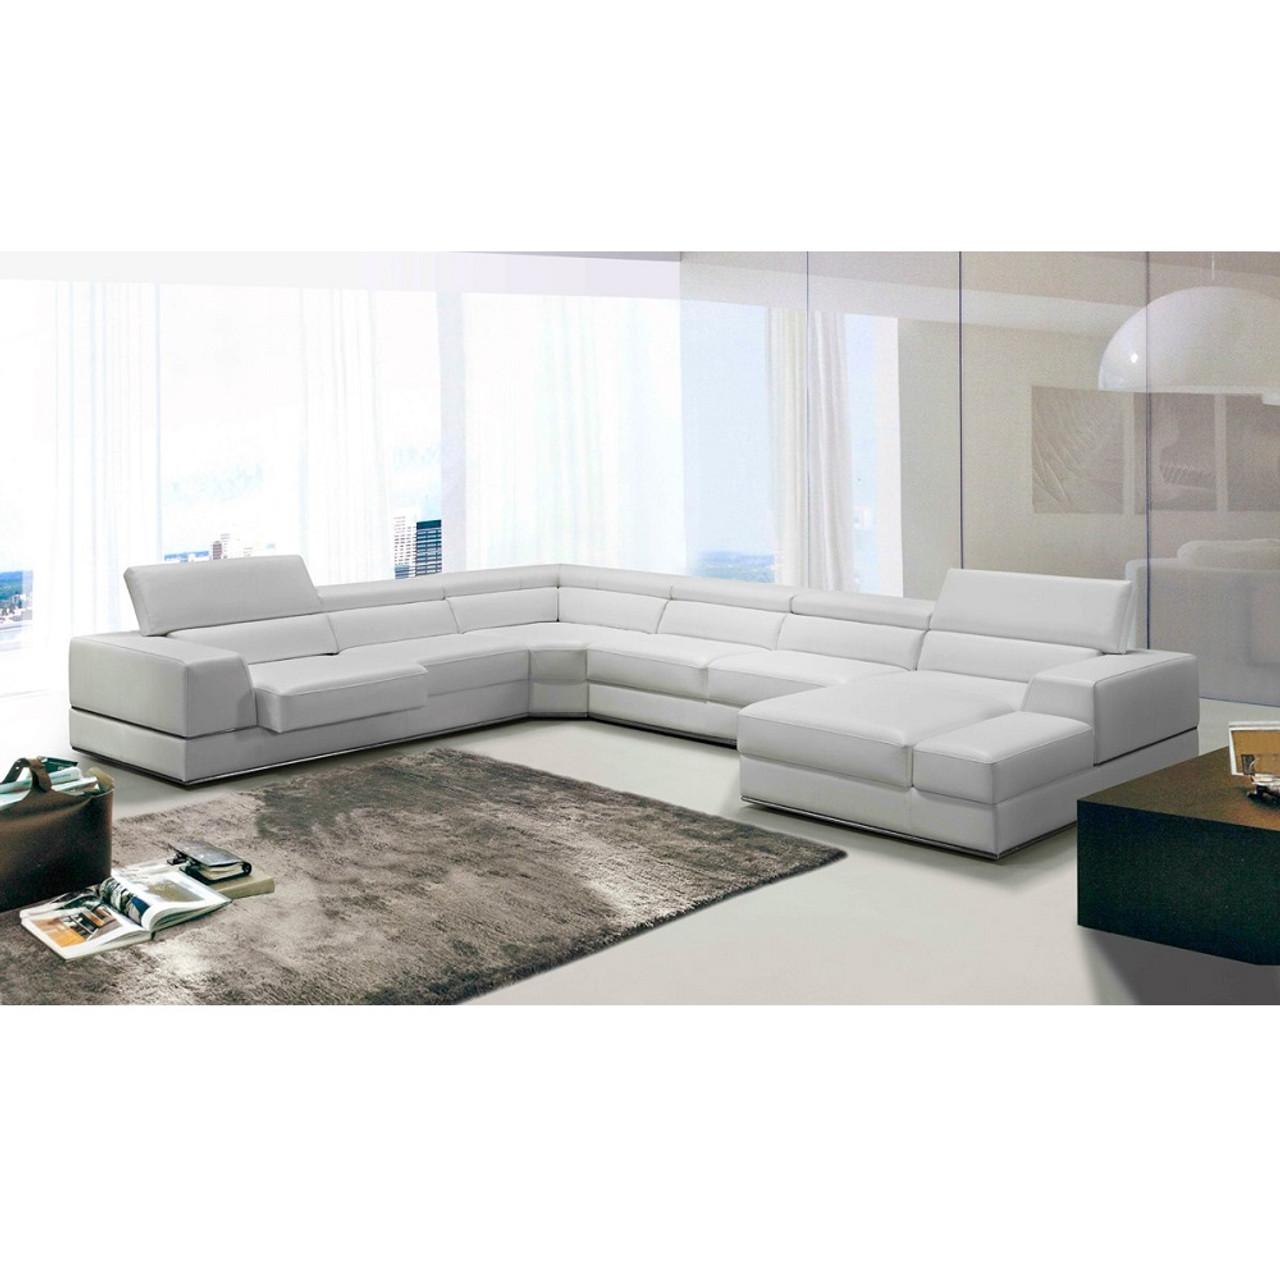 Surprising Divani Casa Pella Modern White Italian Leather Sectional Sofa Creativecarmelina Interior Chair Design Creativecarmelinacom